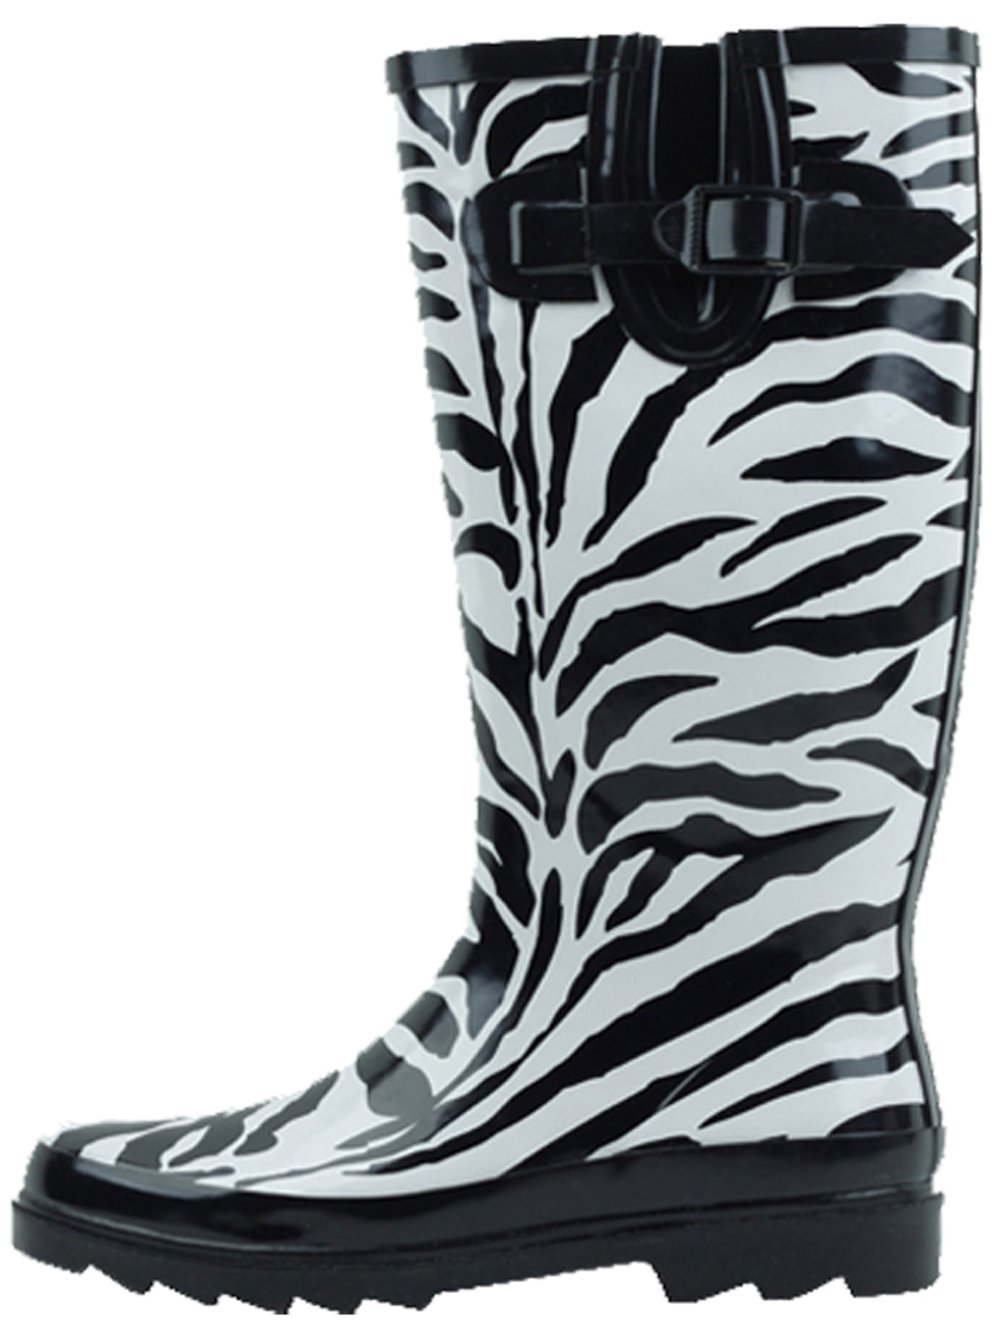 SBC Women's Fashion Rain Boots Adjustable Buckle Fashion Women's Mid Calf Wellies Rubber Knee High Snow Multiple Styles B00QBL1Y2U 7 B(M) US|Zebra f1f357